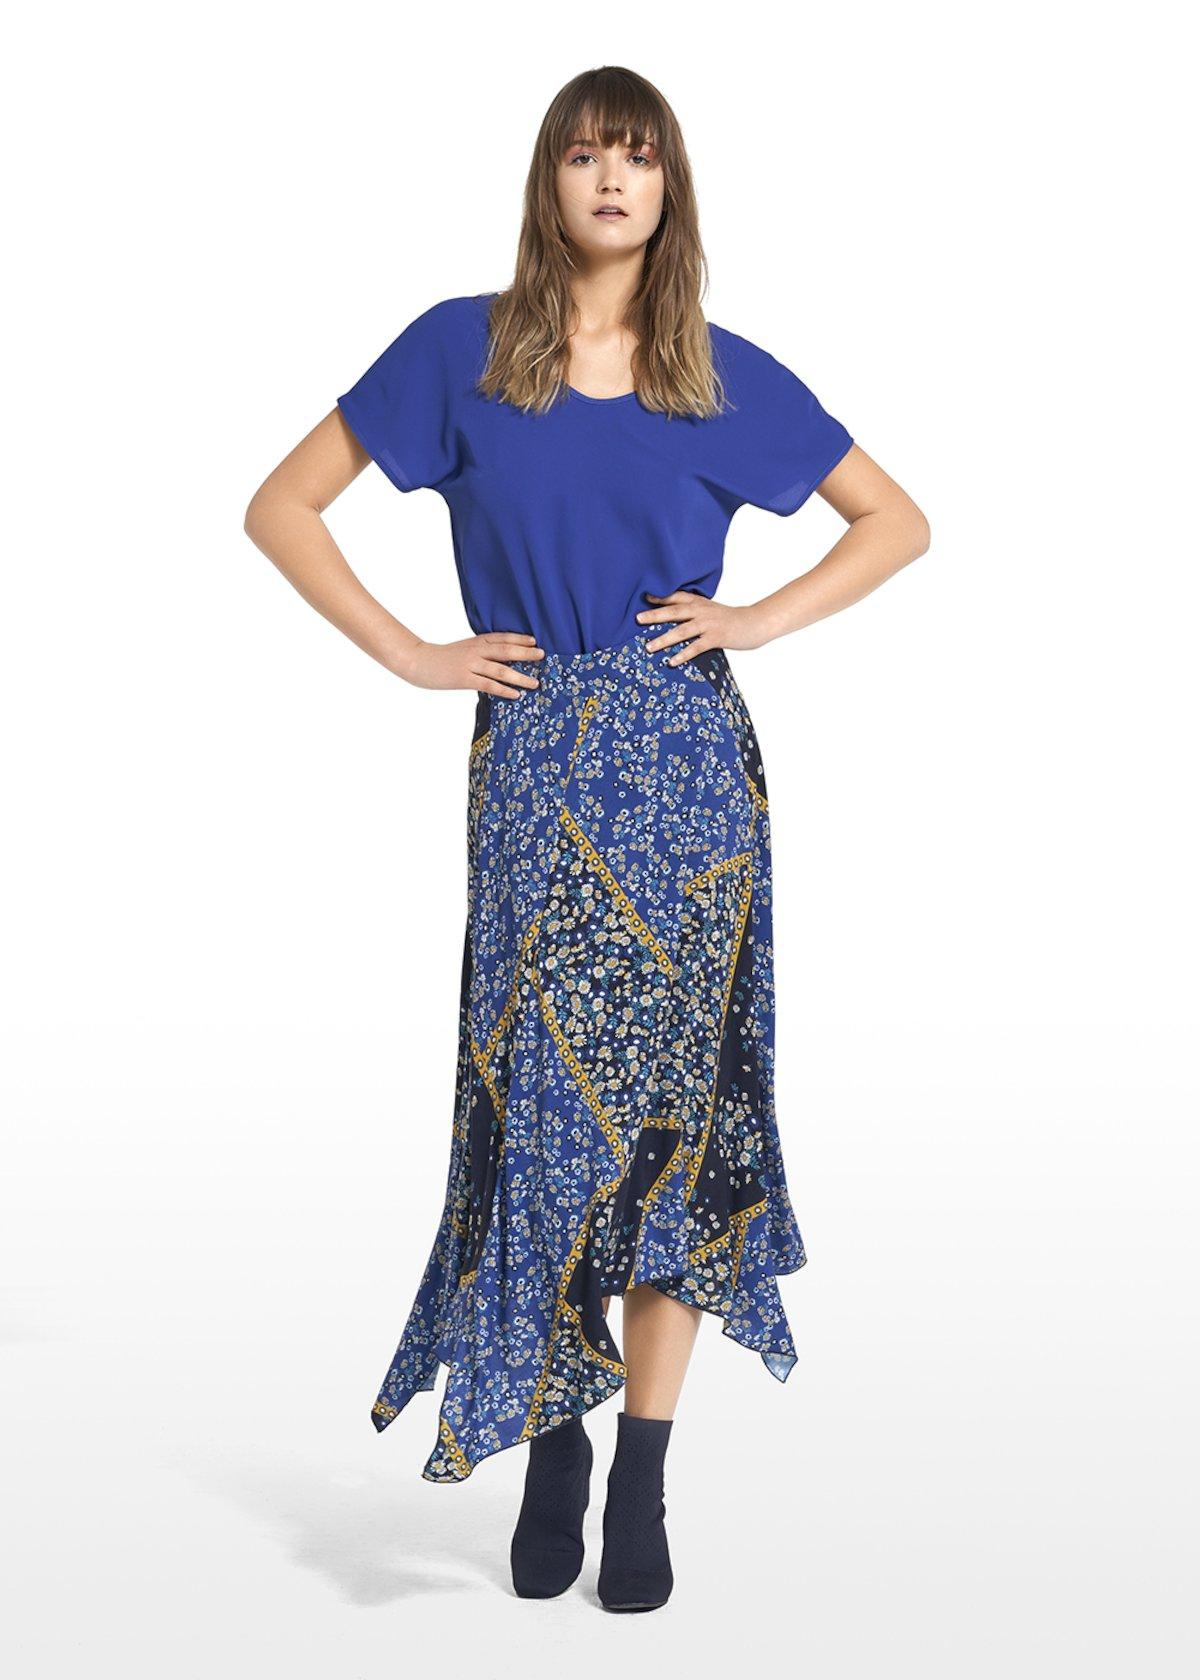 Skirt Glory with asymmetric cut - Avion / Miele Fantasia - Woman